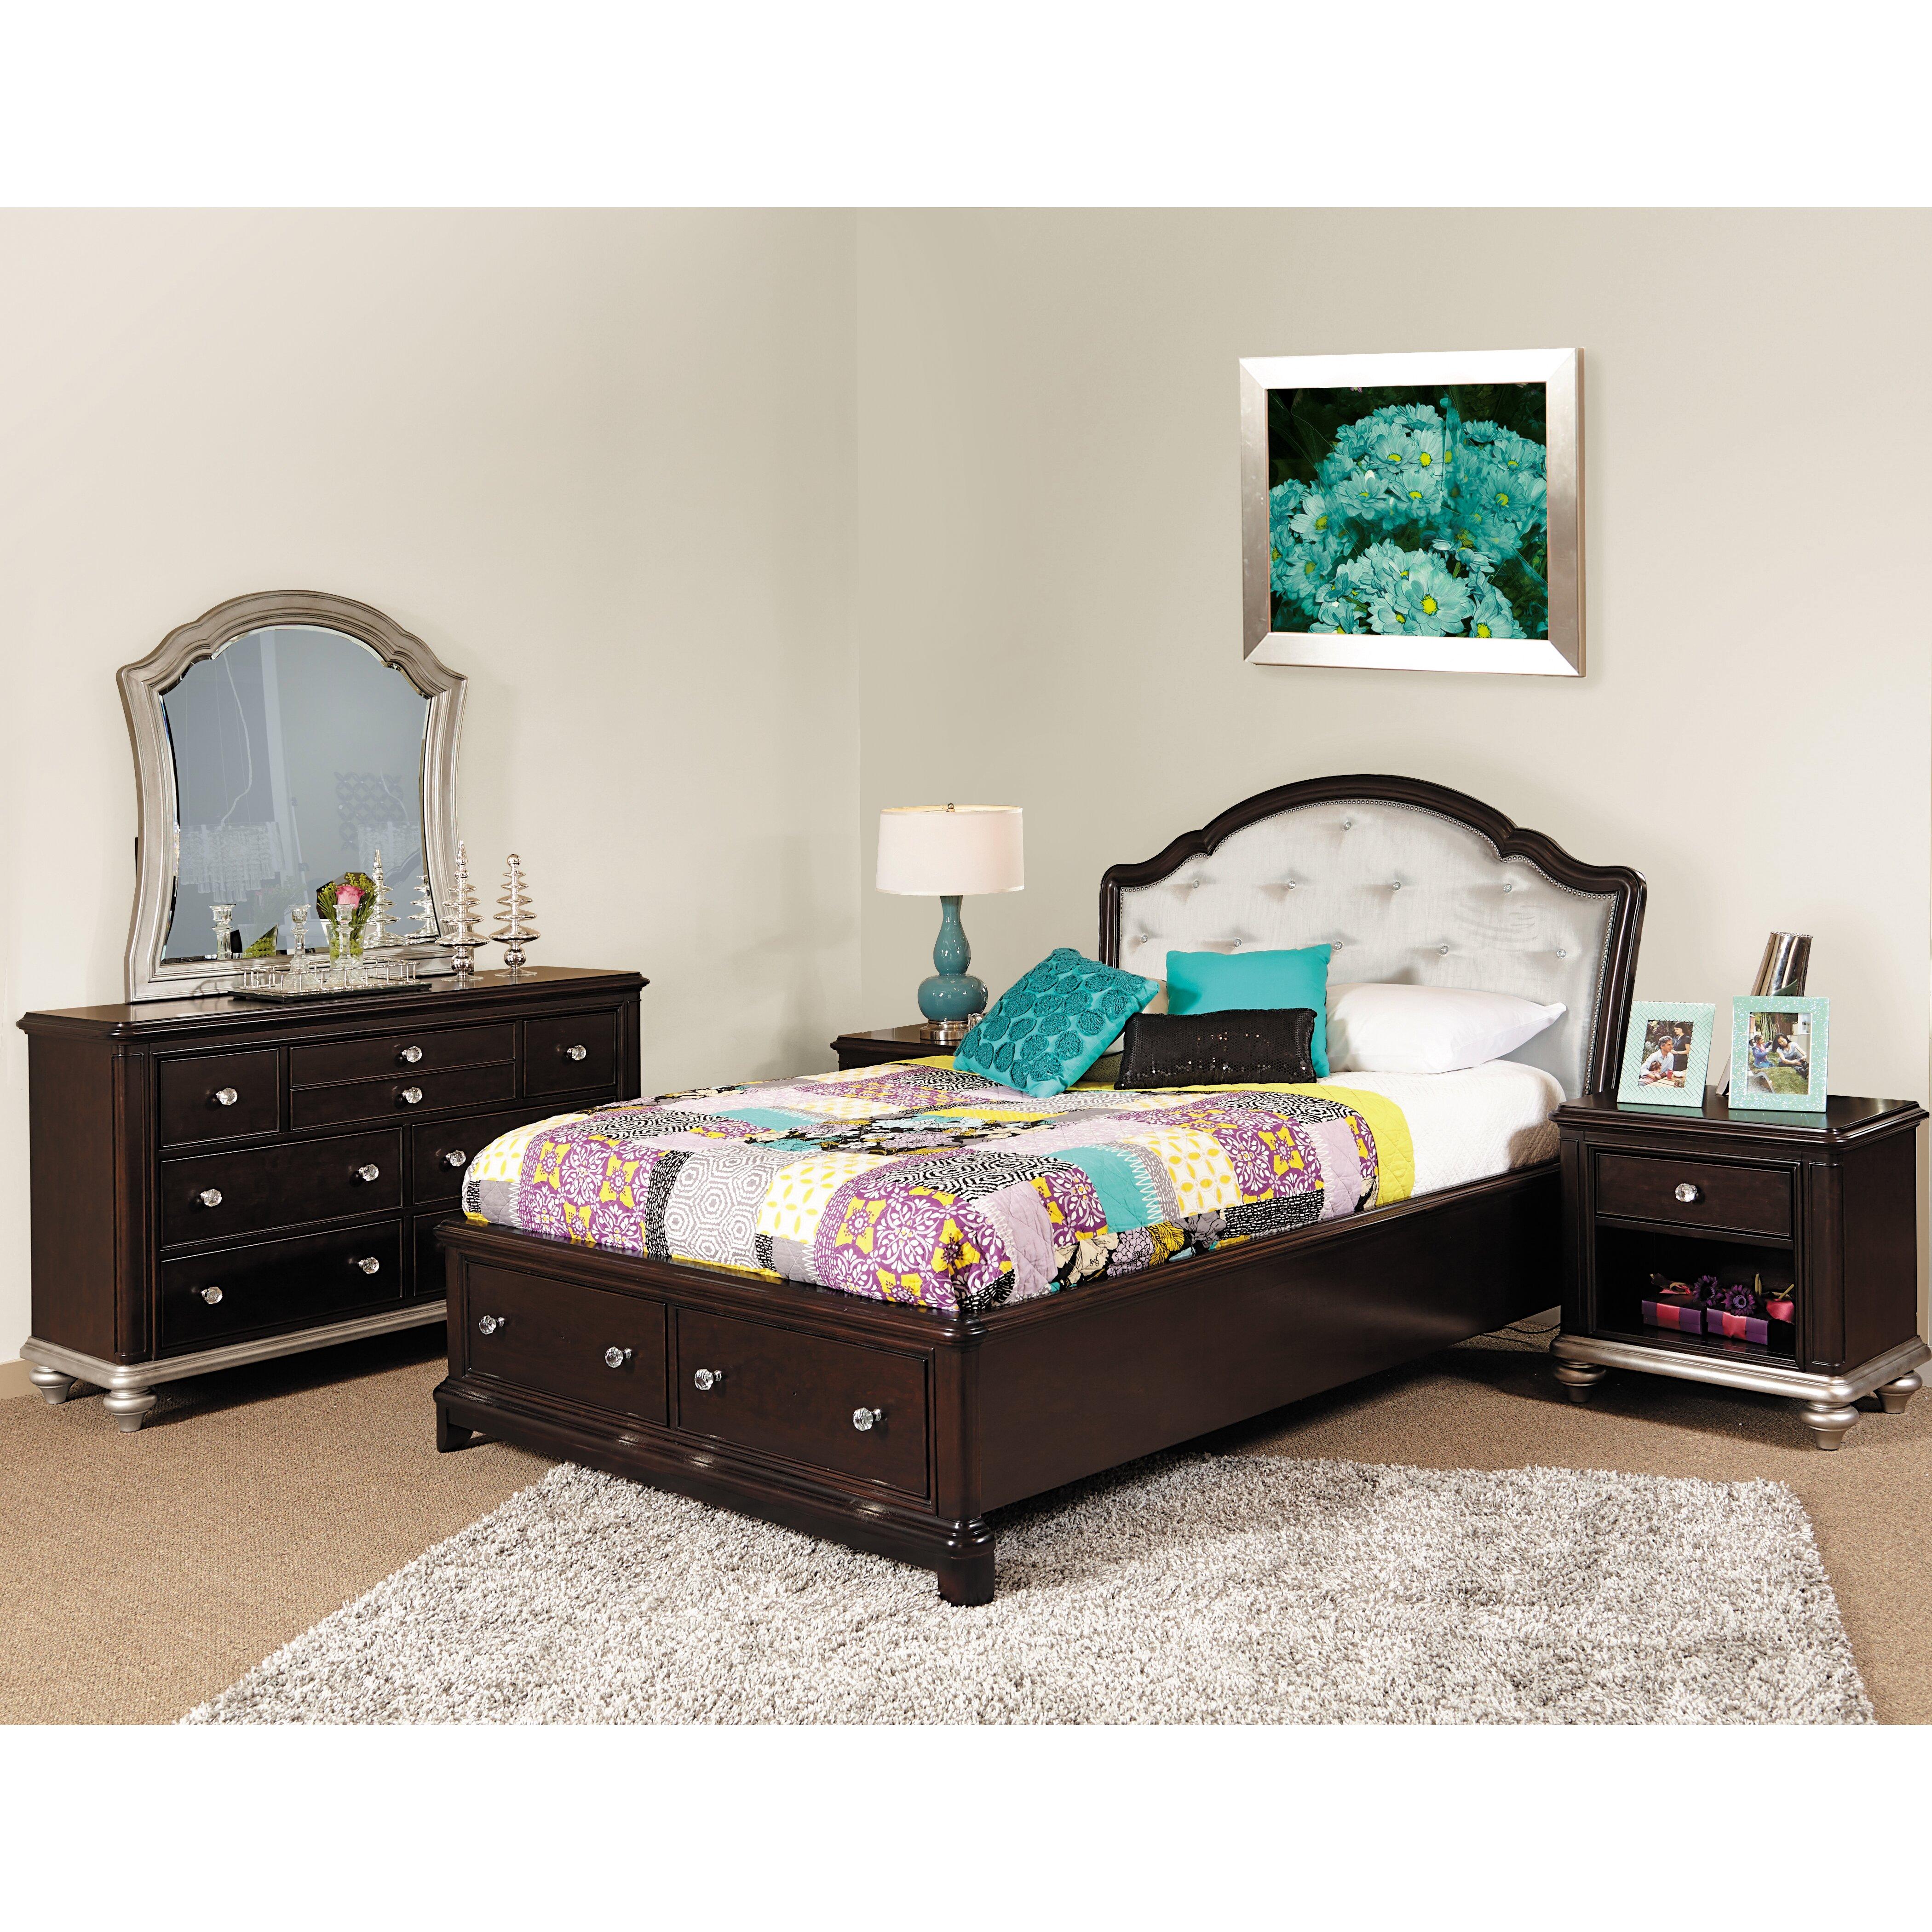 Glam Bedroom Design Photo By Wayfair: Samuel Lawrence Girls' Glam Panel Headboard & Reviews